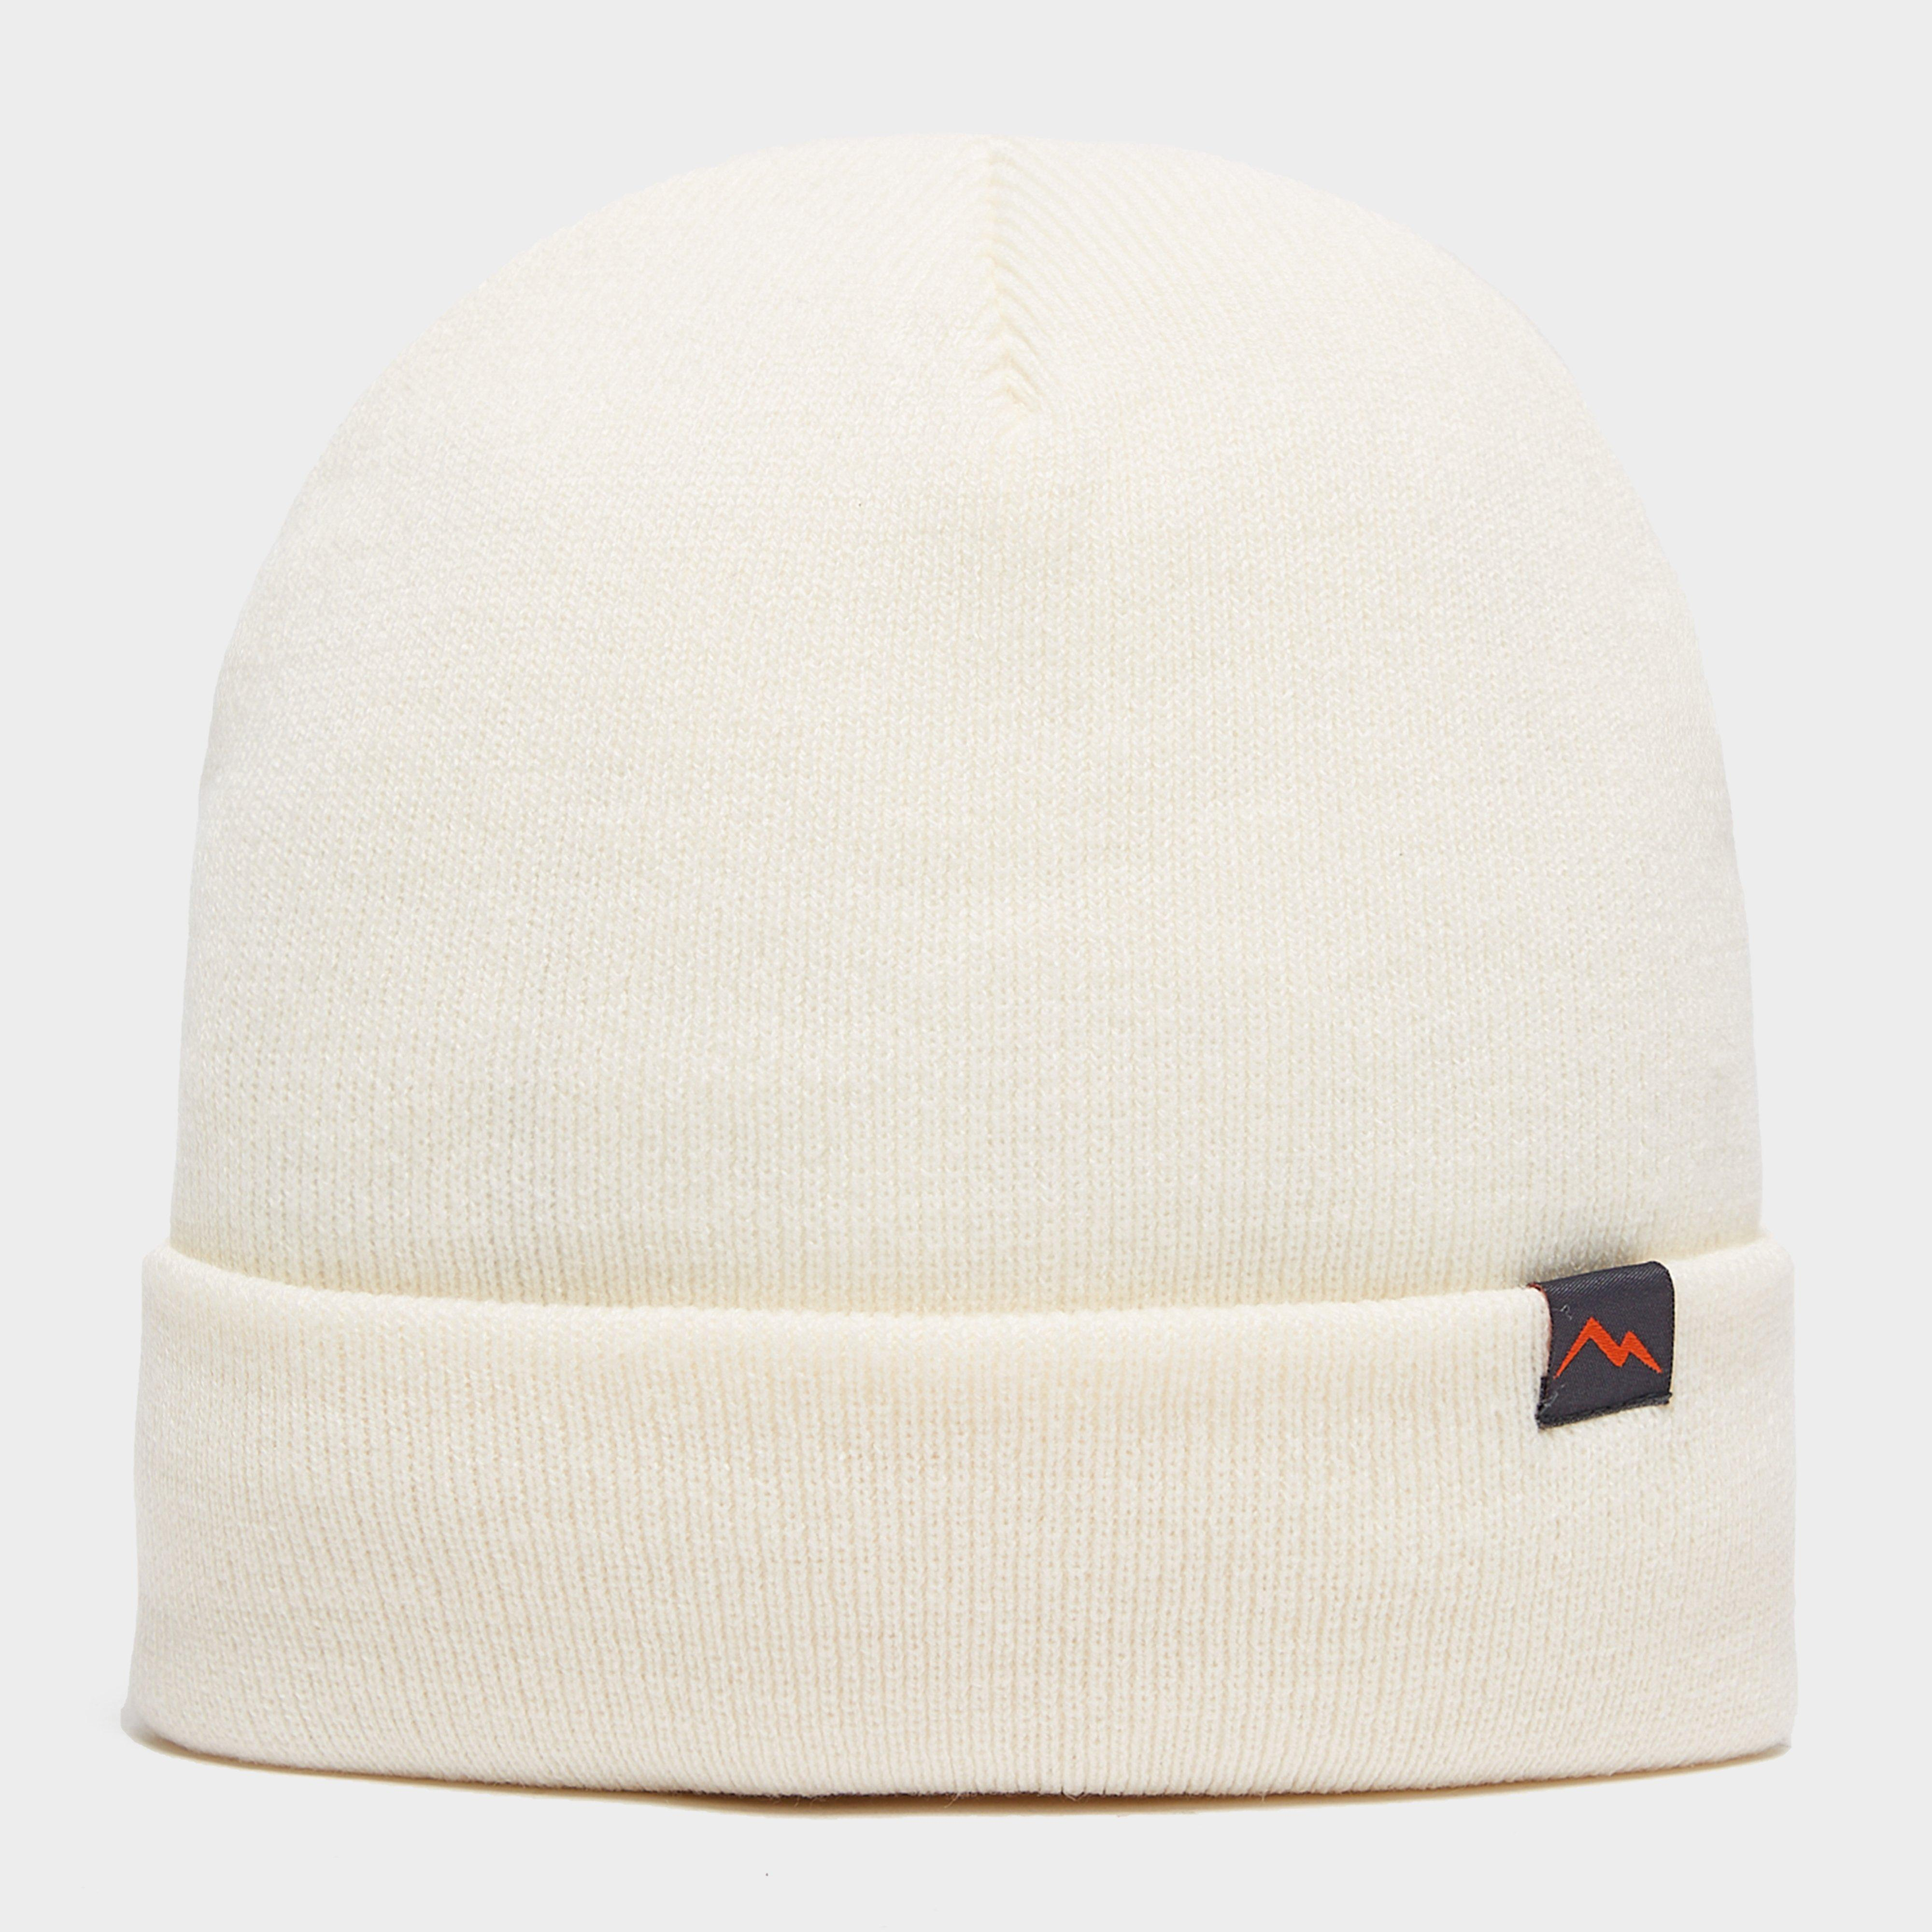 Peter Storm Unisex Thinsulate Beanie Hat White